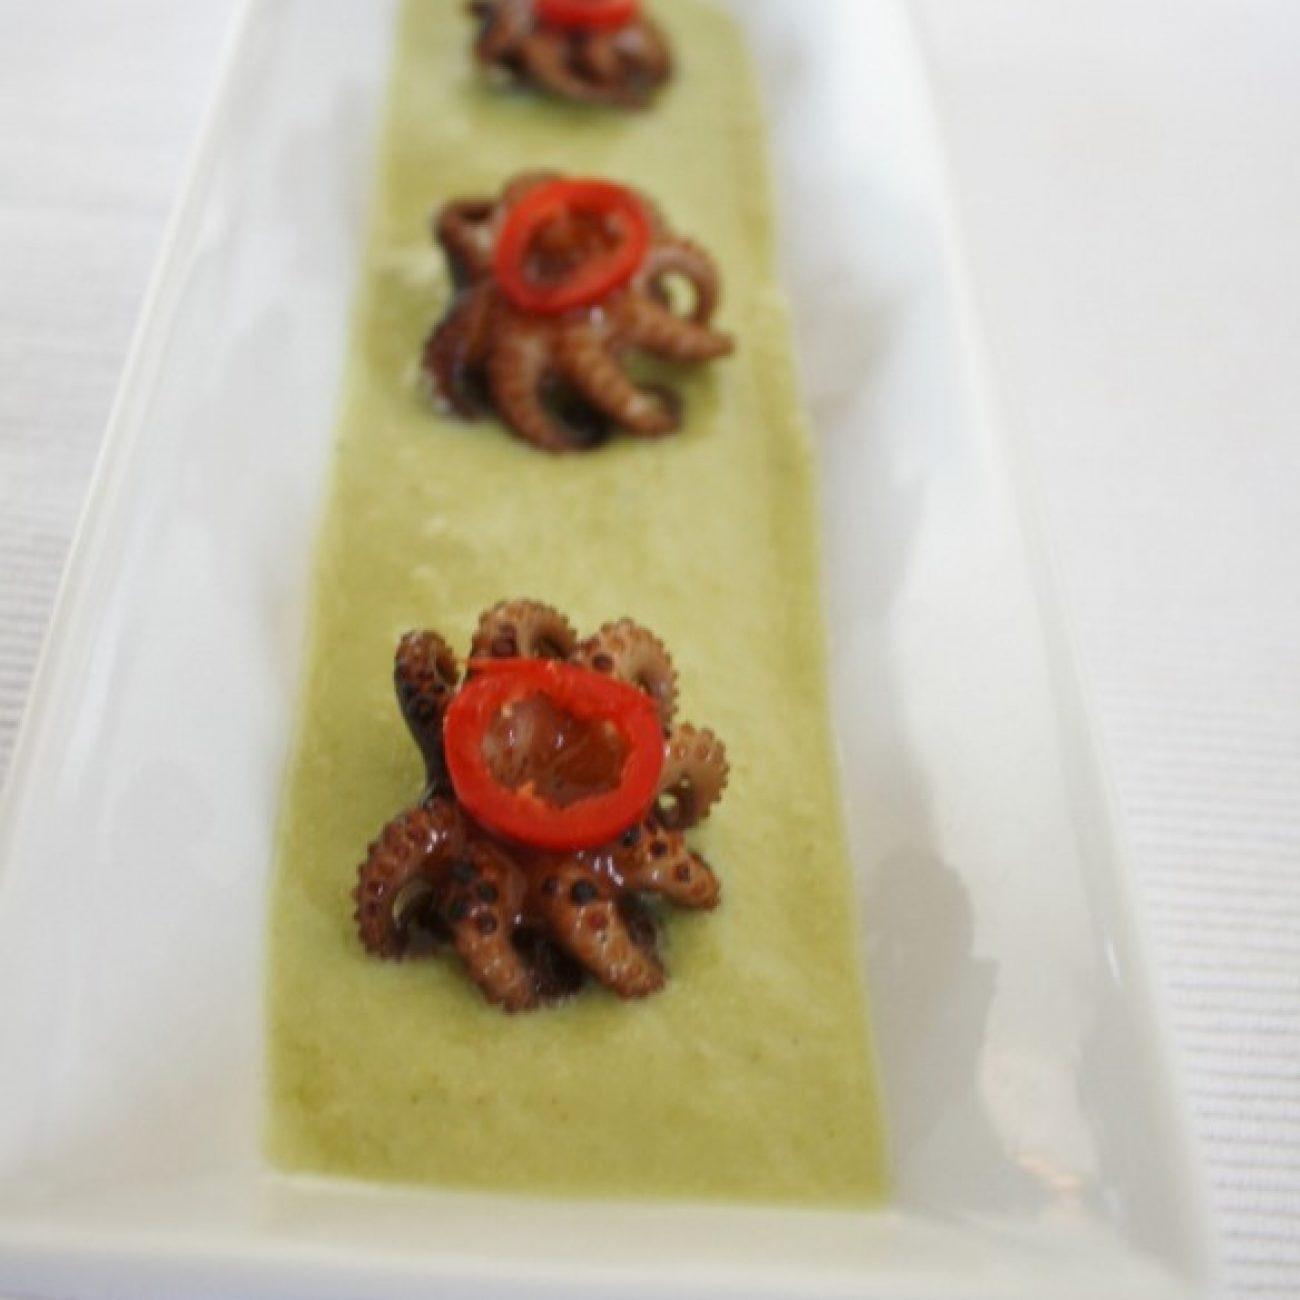 Crispy Octopus and Edamame